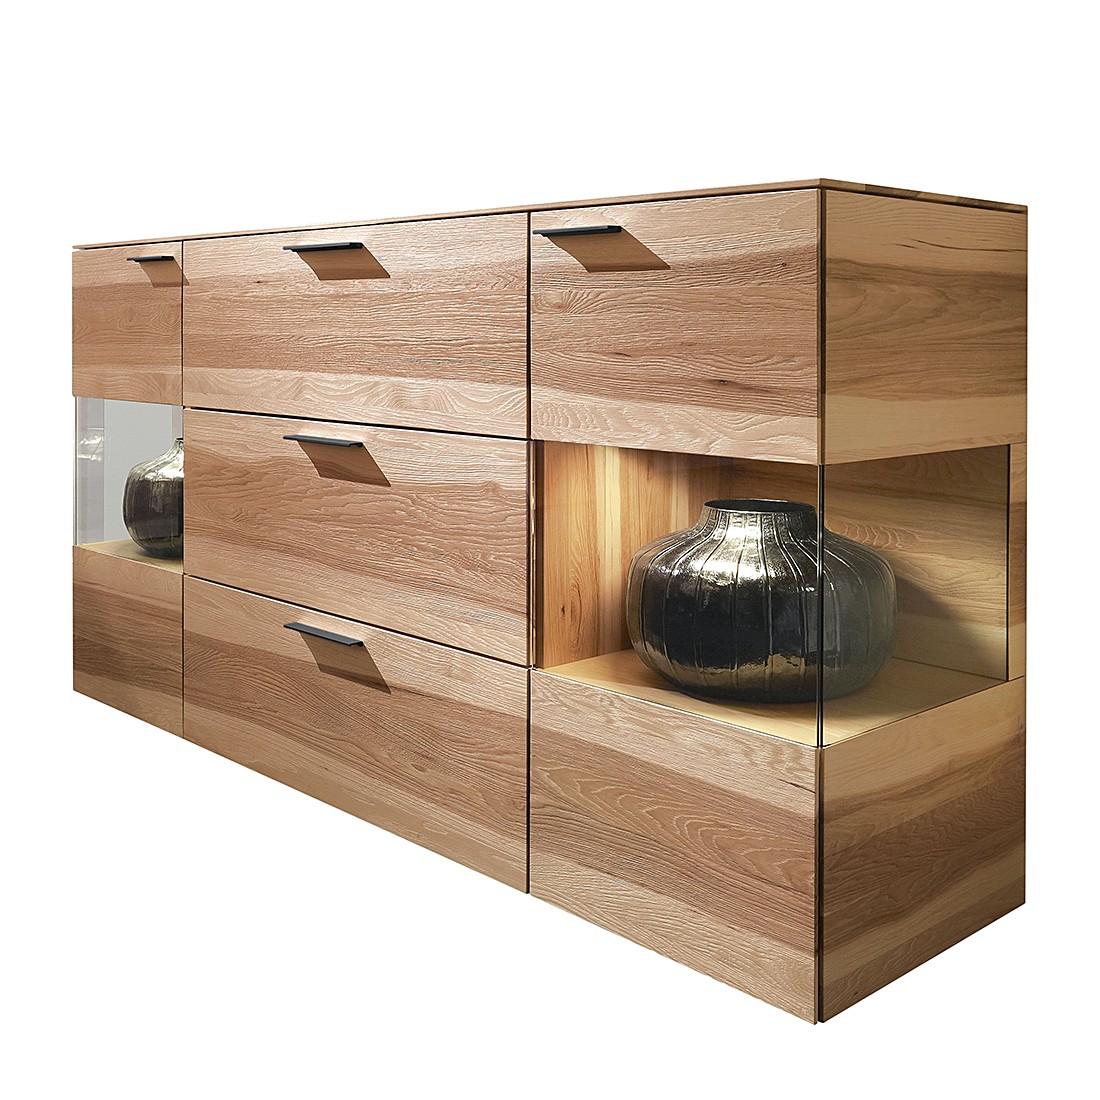 eek a sideboard pecano ii pecan nuss massiv mit. Black Bedroom Furniture Sets. Home Design Ideas